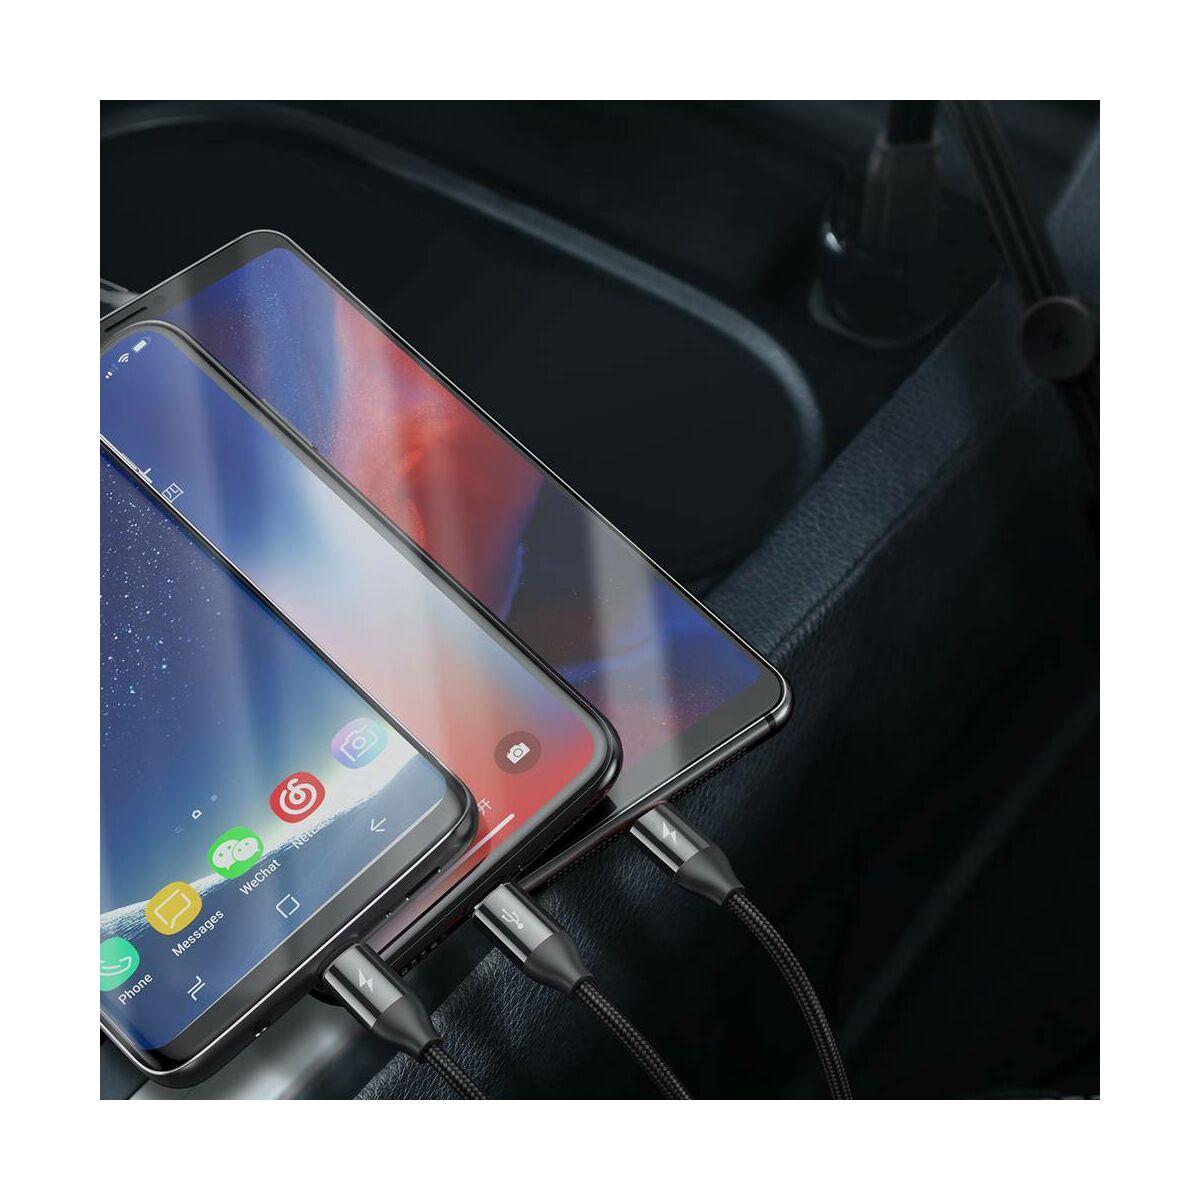 Baseus Univerzális kábel, 3-in-1 Car Co-sharing (Micro + Lightning + Type-C), 3.5A, 1m, fekete (CAMLT-FX01)